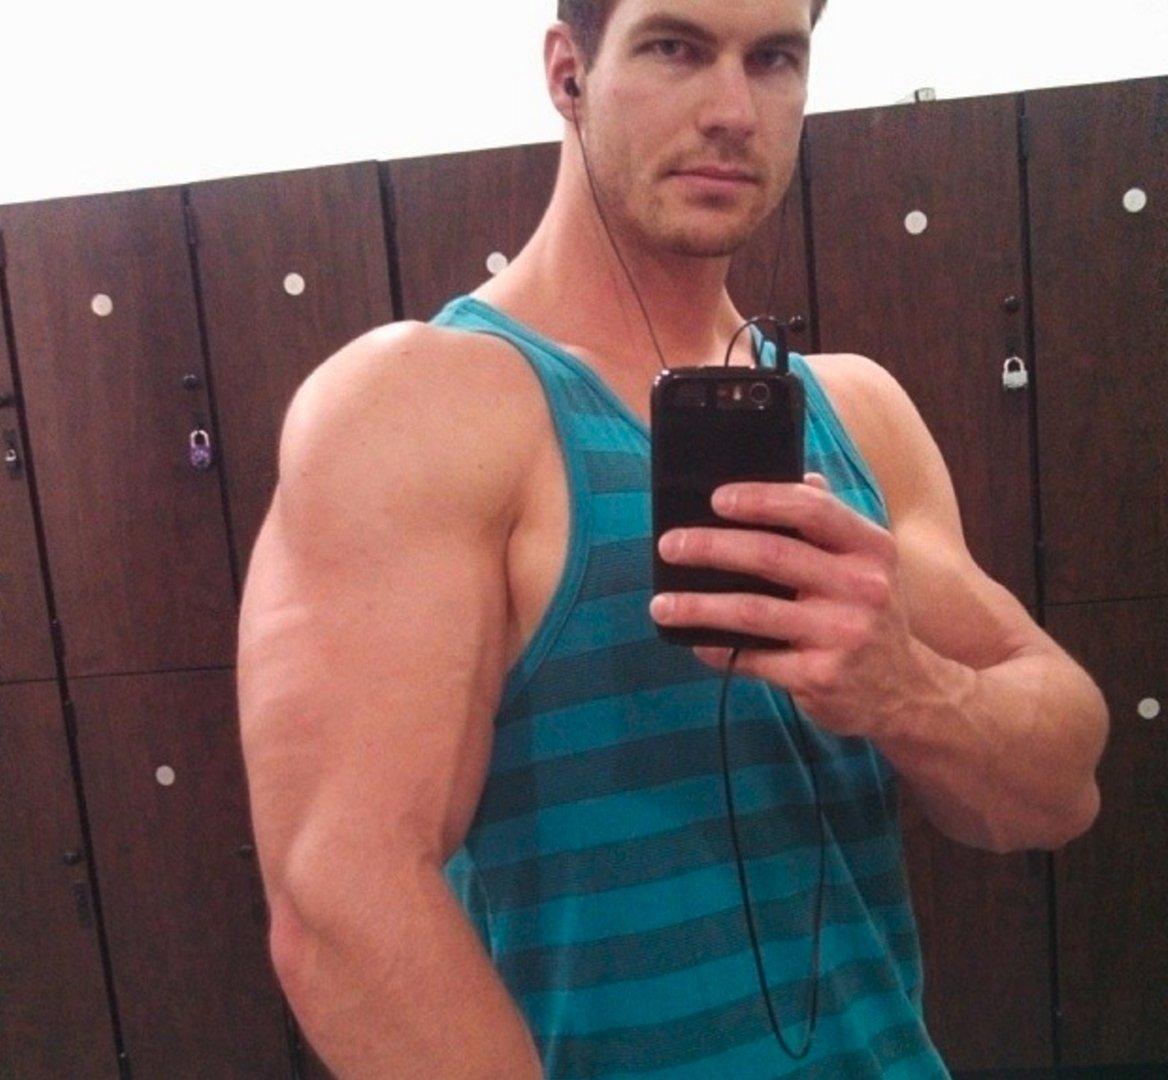 My OK gym buddy from  http:// GlobalFight.com  &nbsp;   #oklahoma #gym #man #selfie #muscles #biceps #lockerroom #cute #handsome #wrestler #guy #dude<br>http://pic.twitter.com/zkJ8AES2yQ